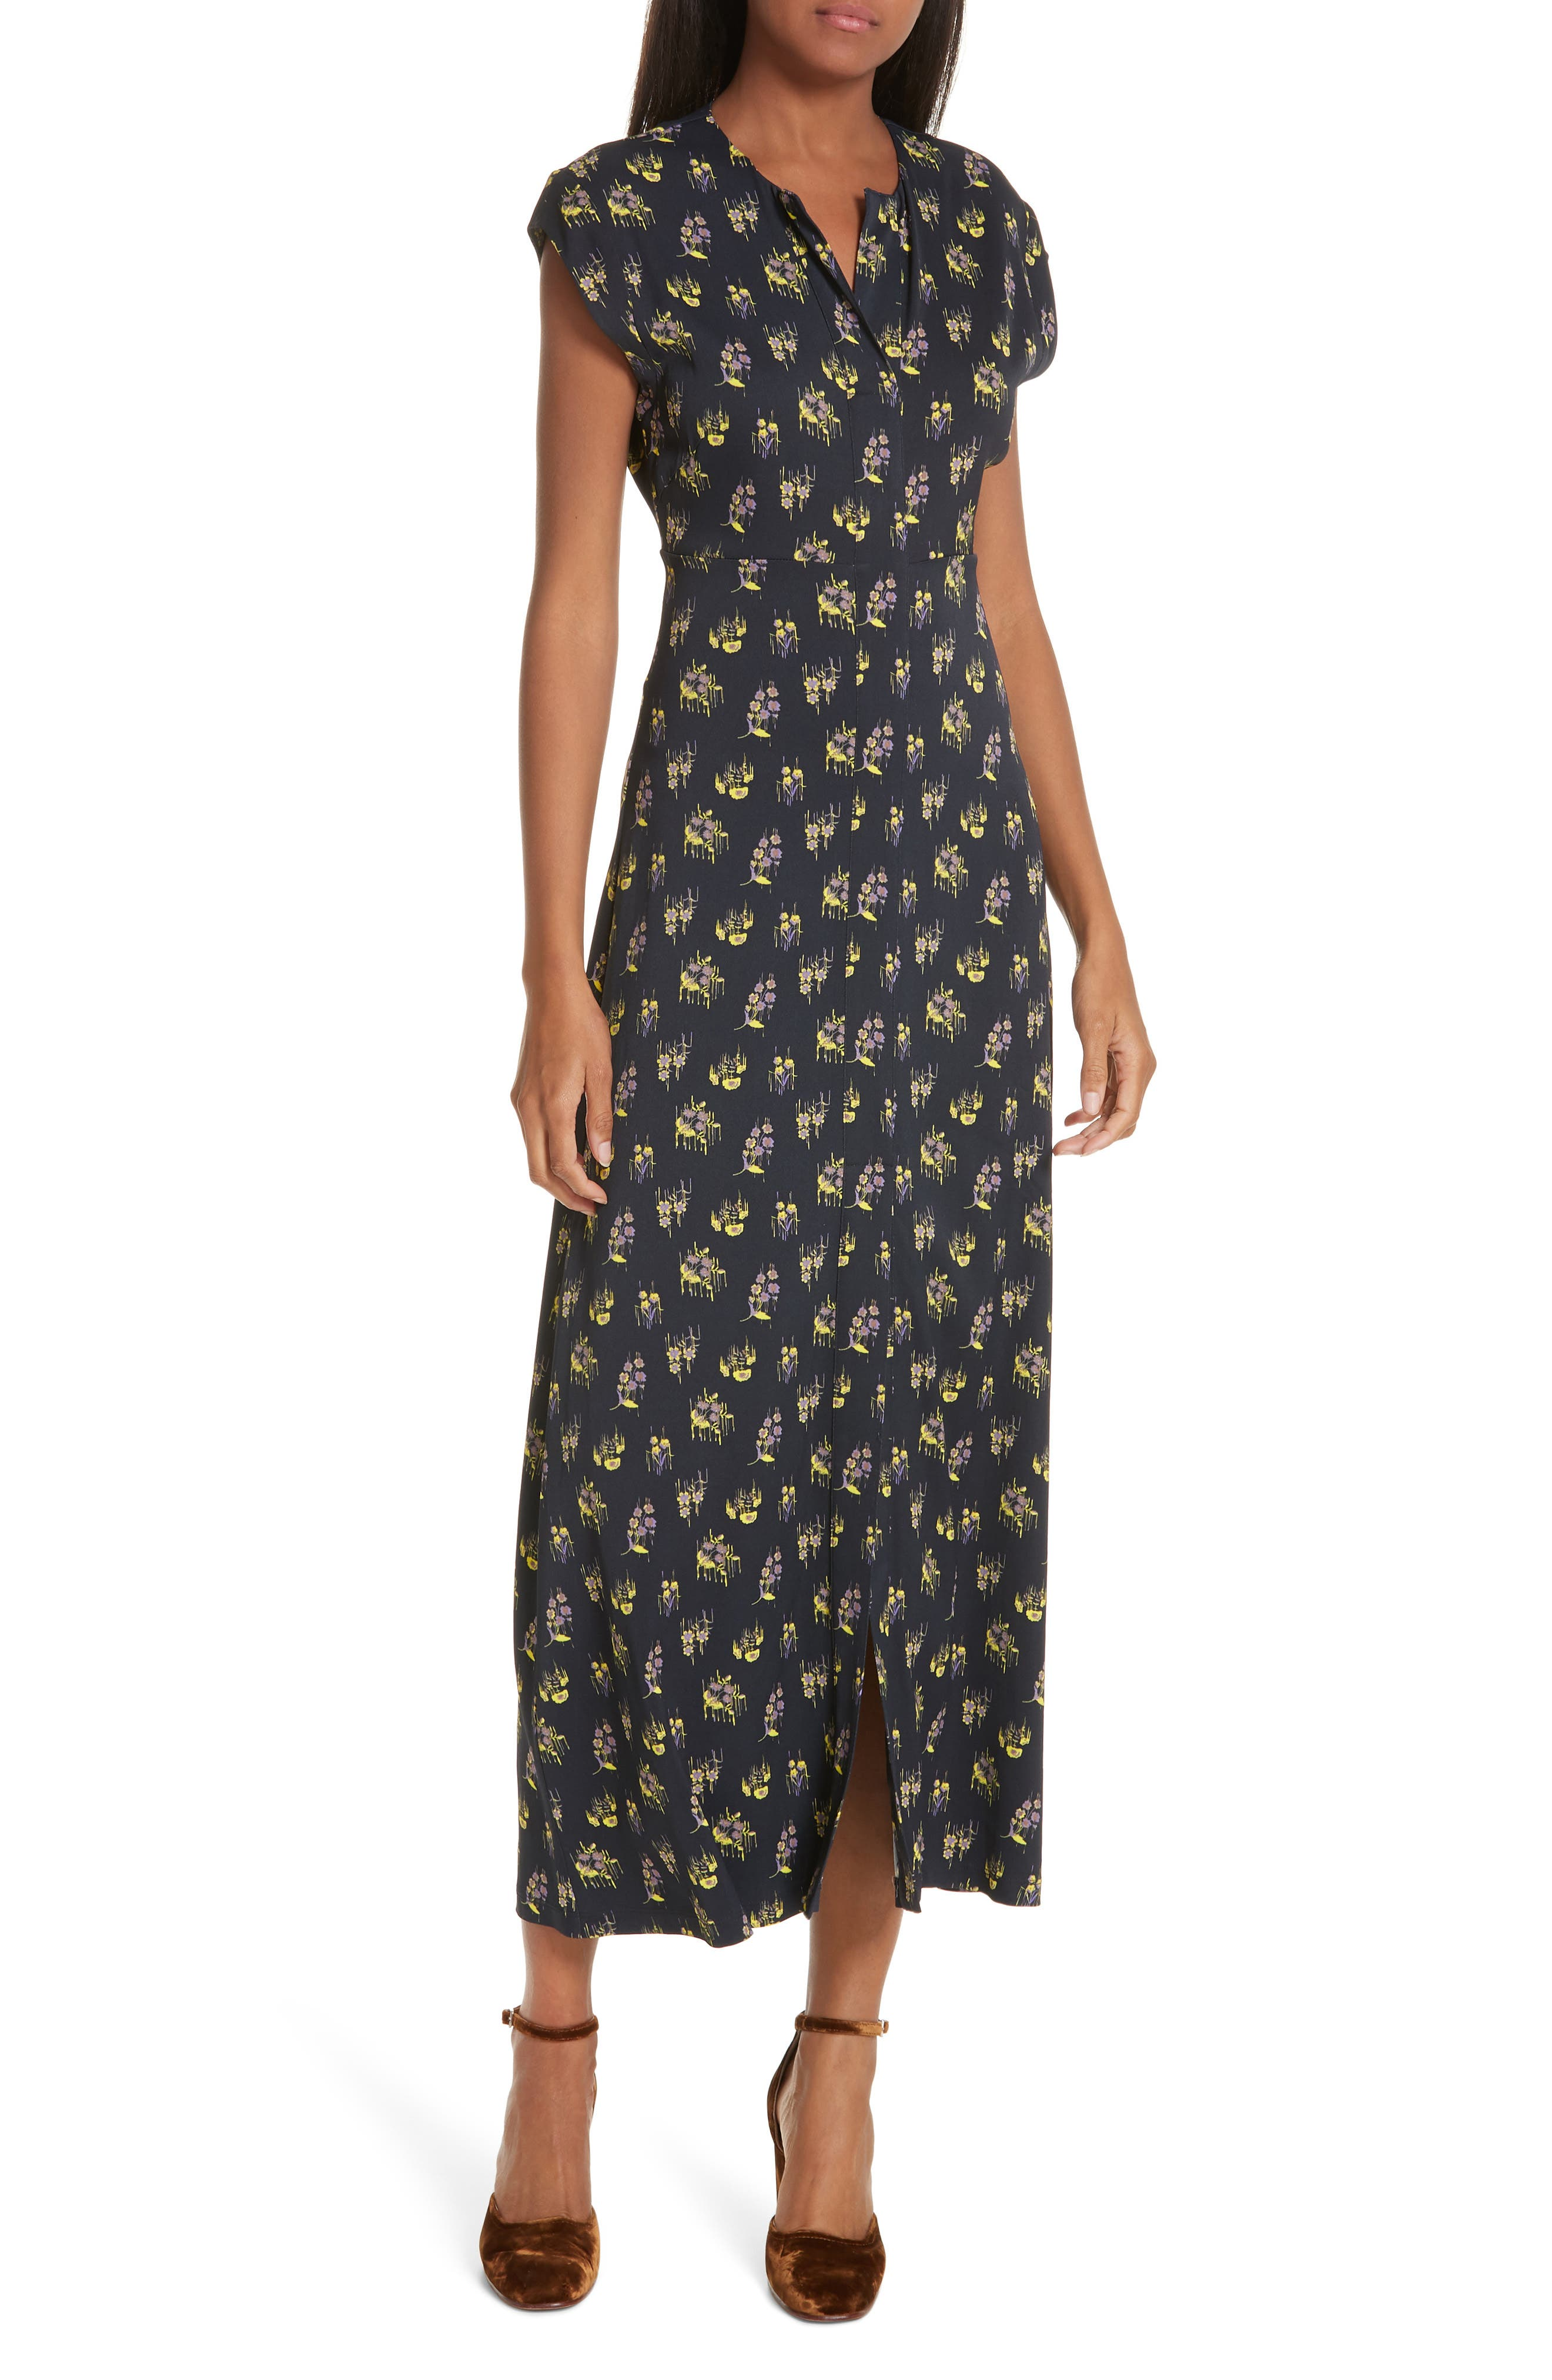 Rachel Comey Chrysanthemum Print Dress, Black